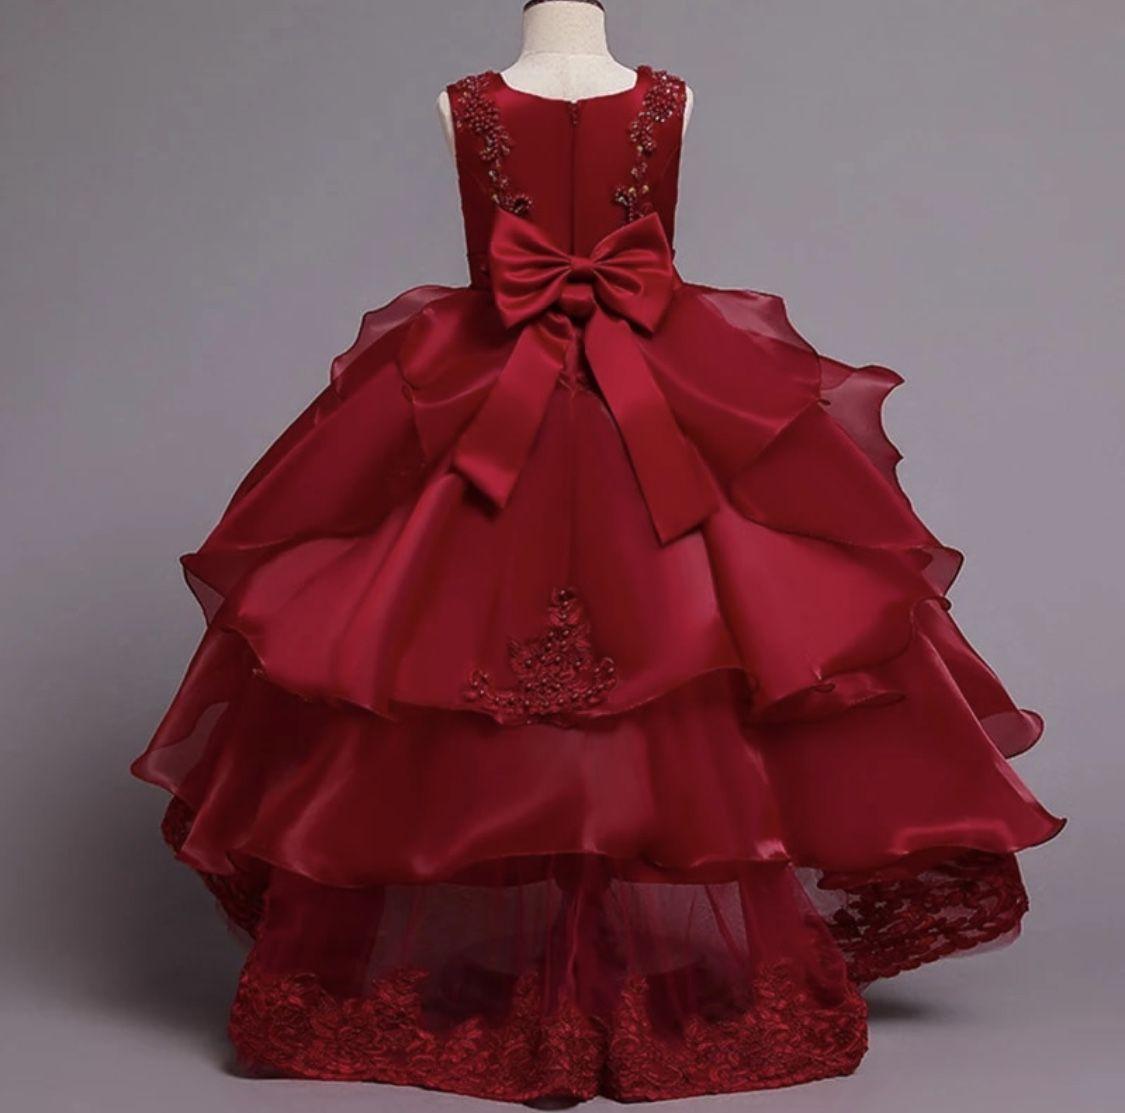 Pin By Maria Hernandez On Moda De Nin S Y Mama Victorian Dress Dresses Fashion